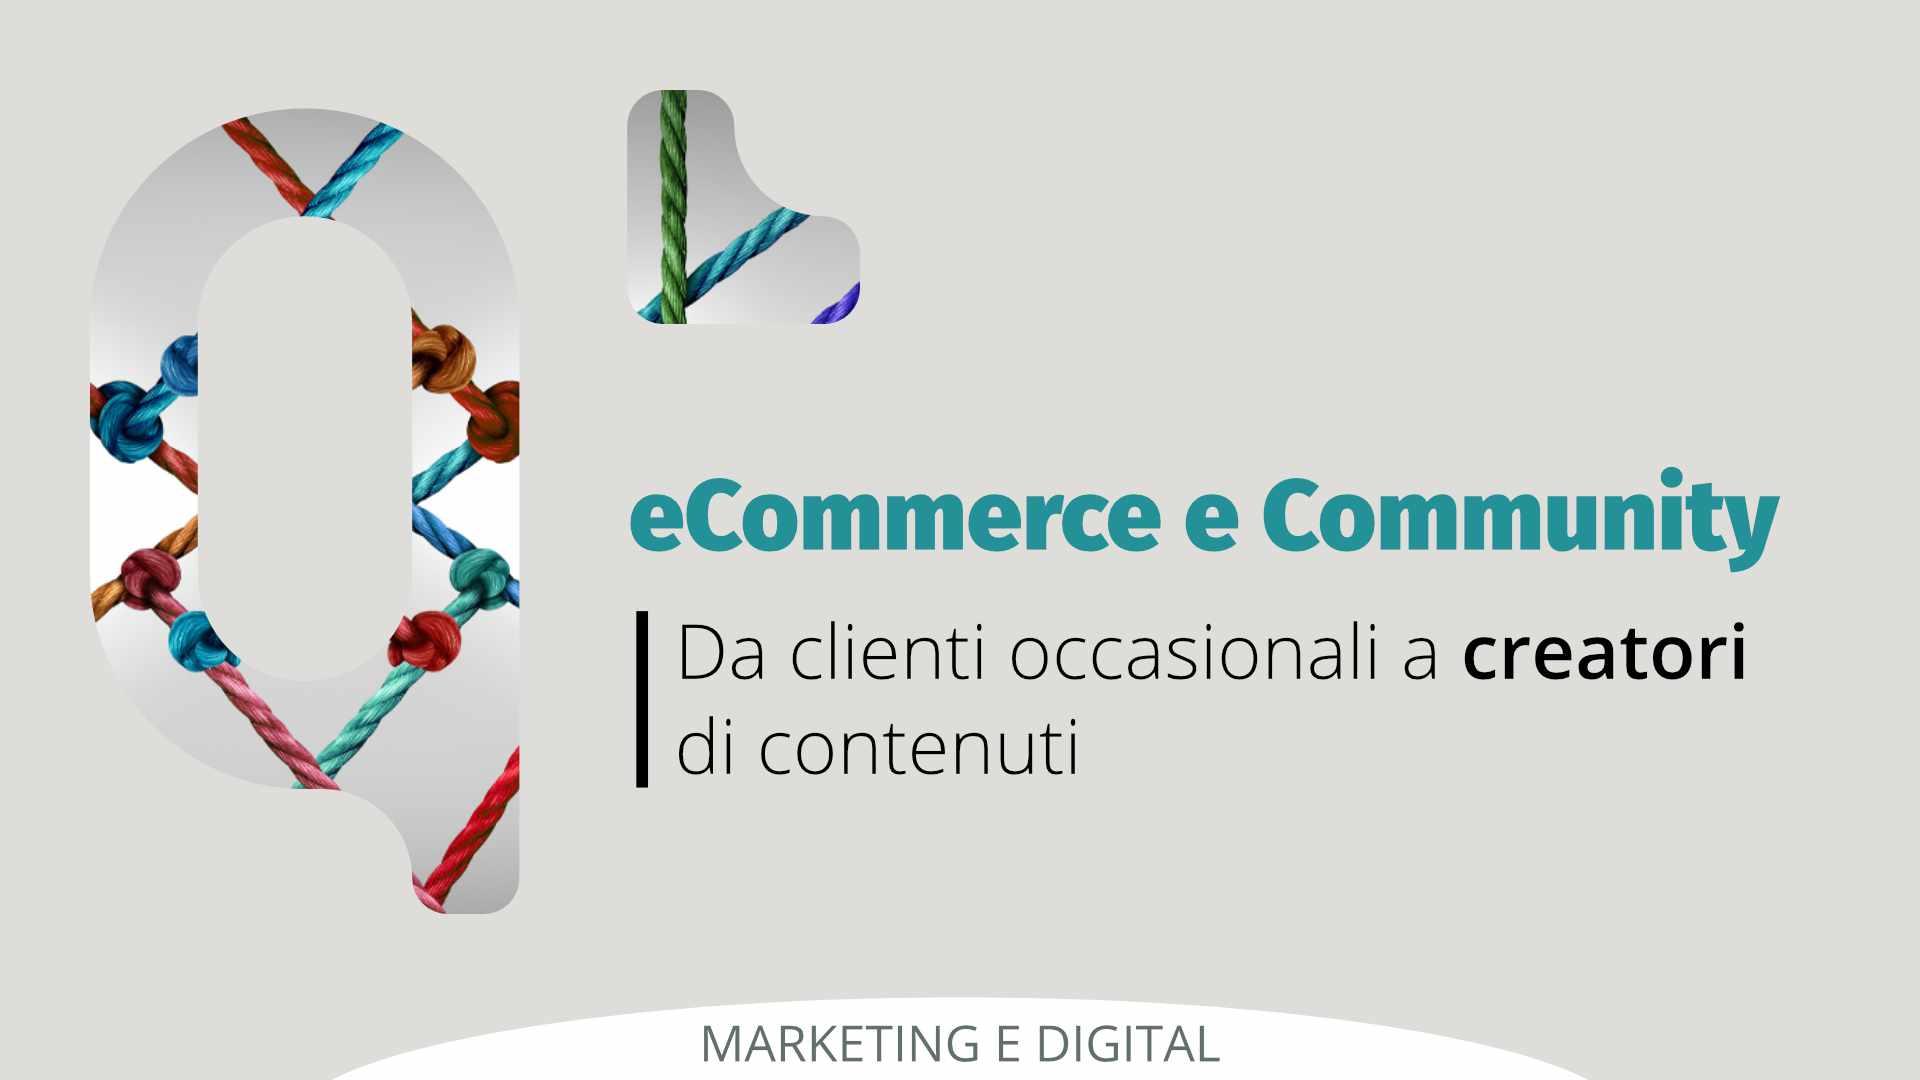 eCommerce e Community